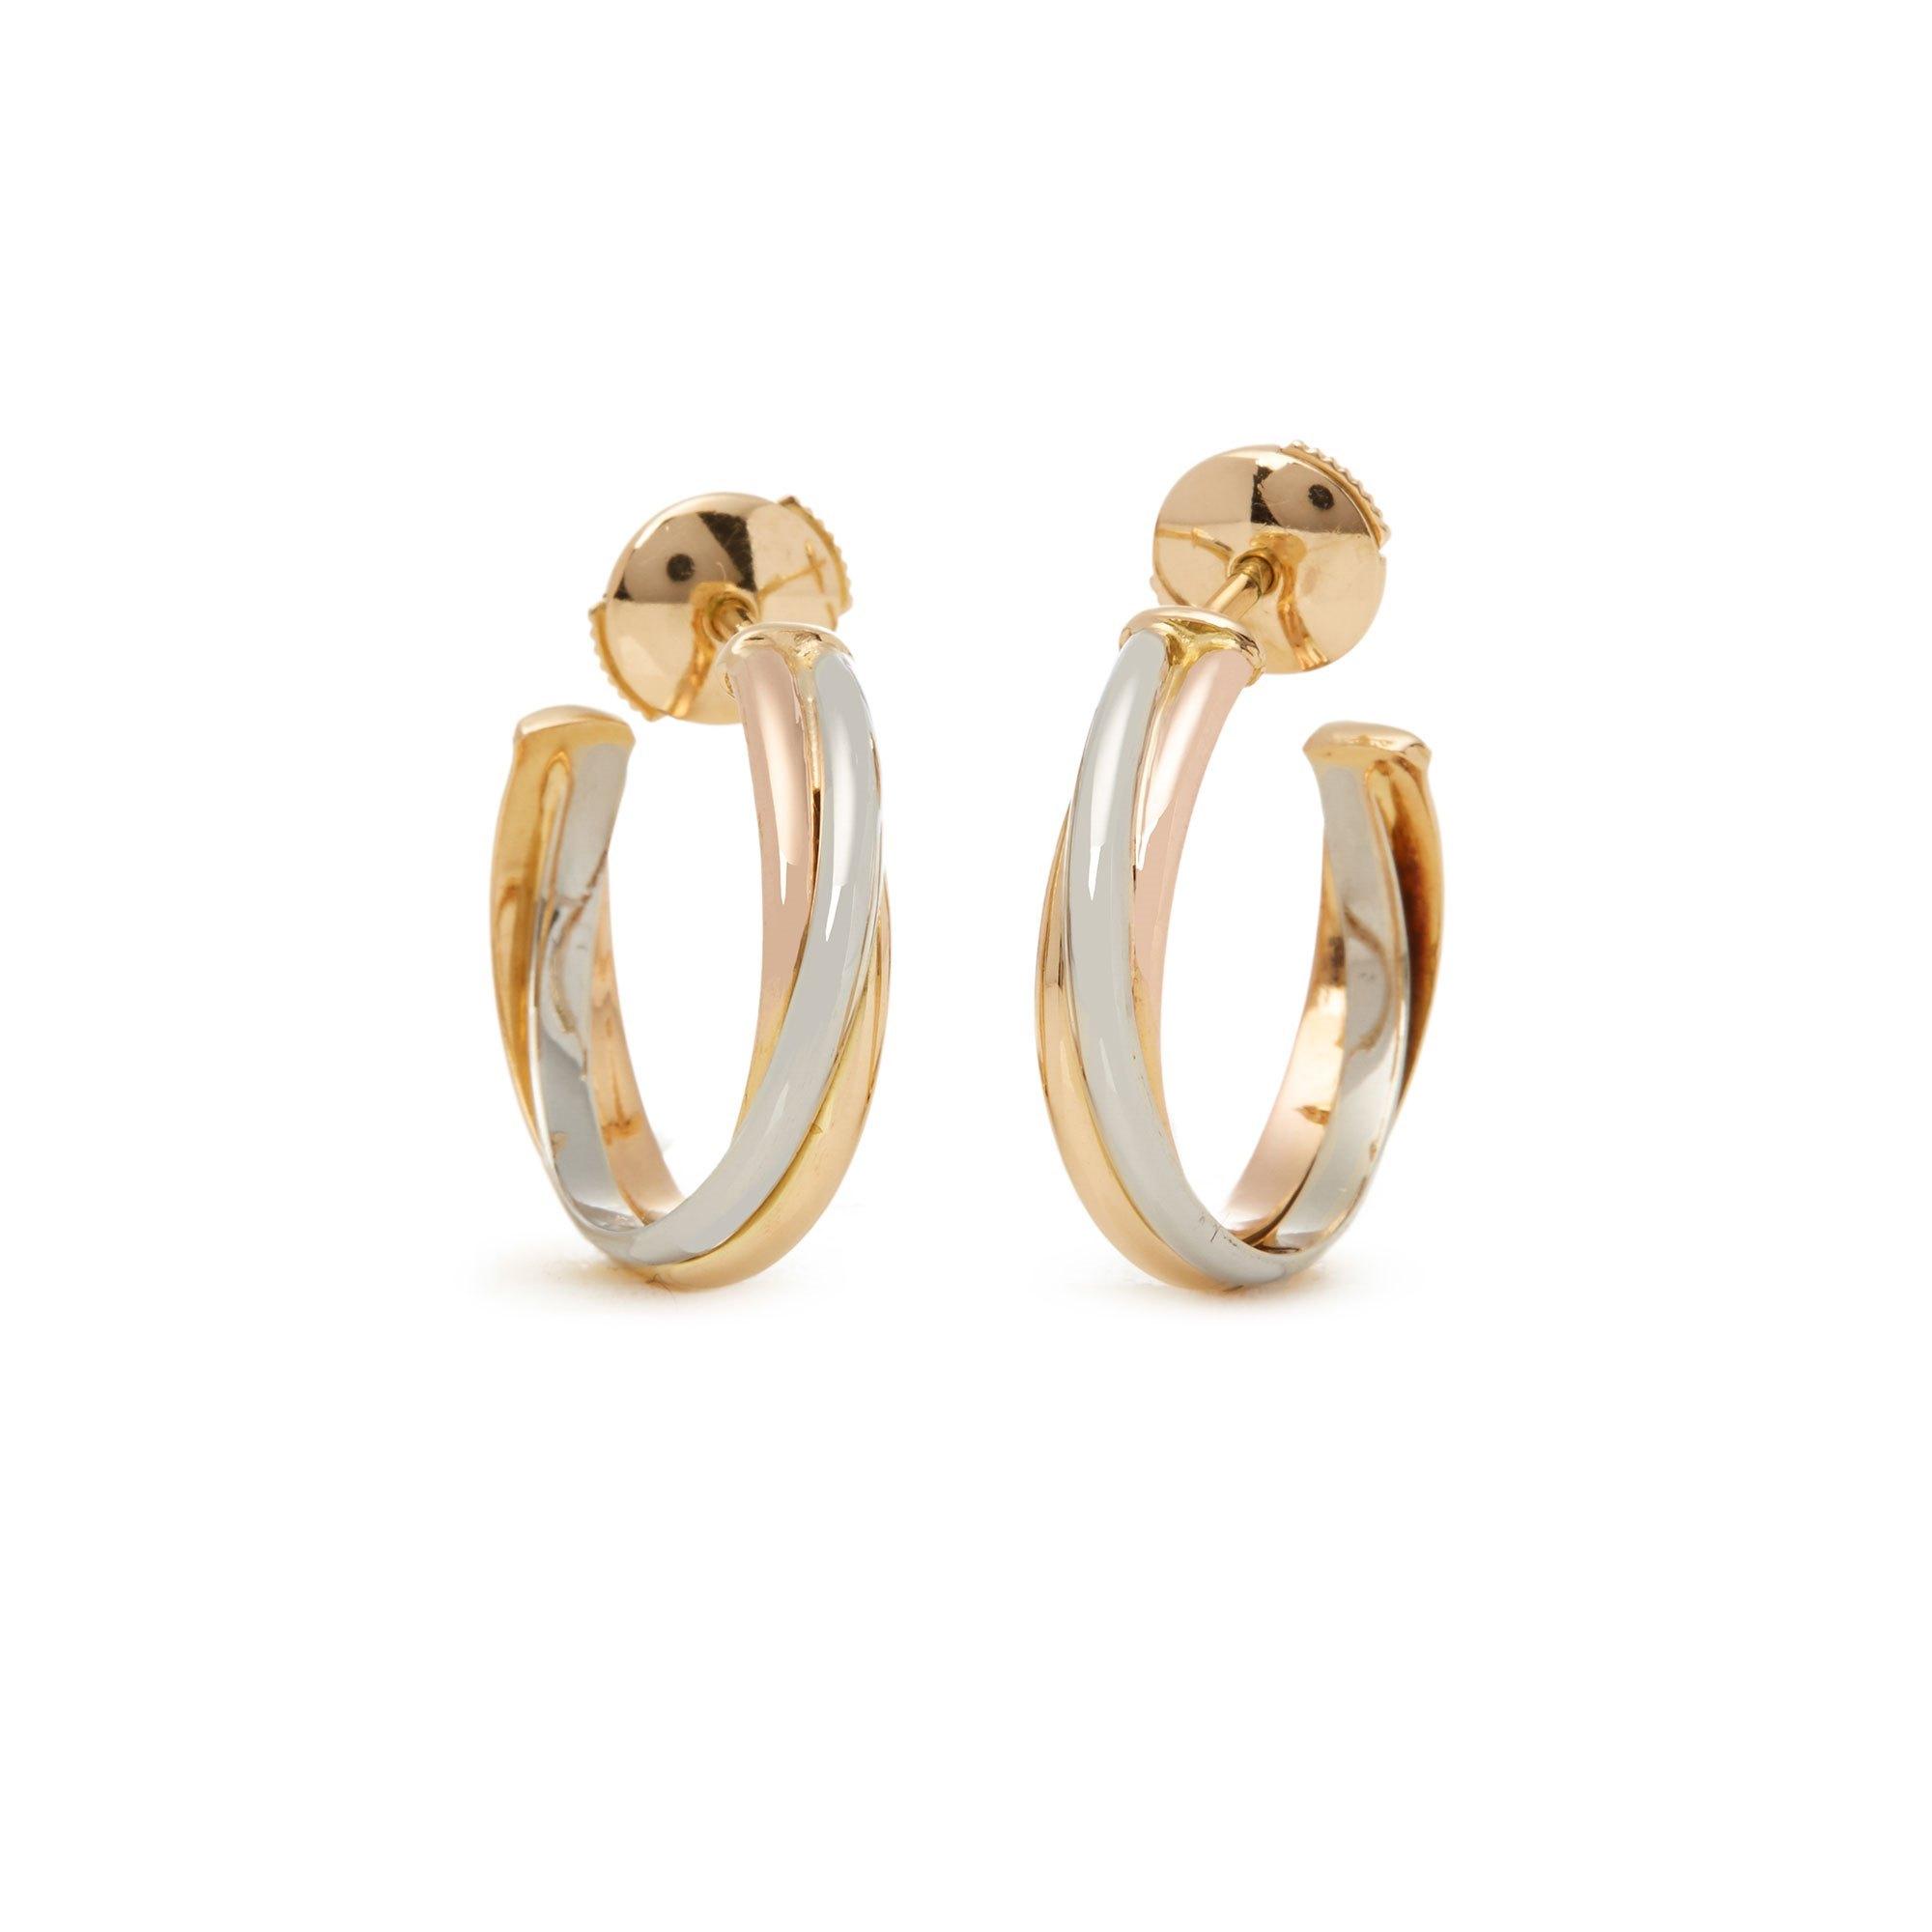 Cartier Trinity 18ct Gold Hoop Earrings